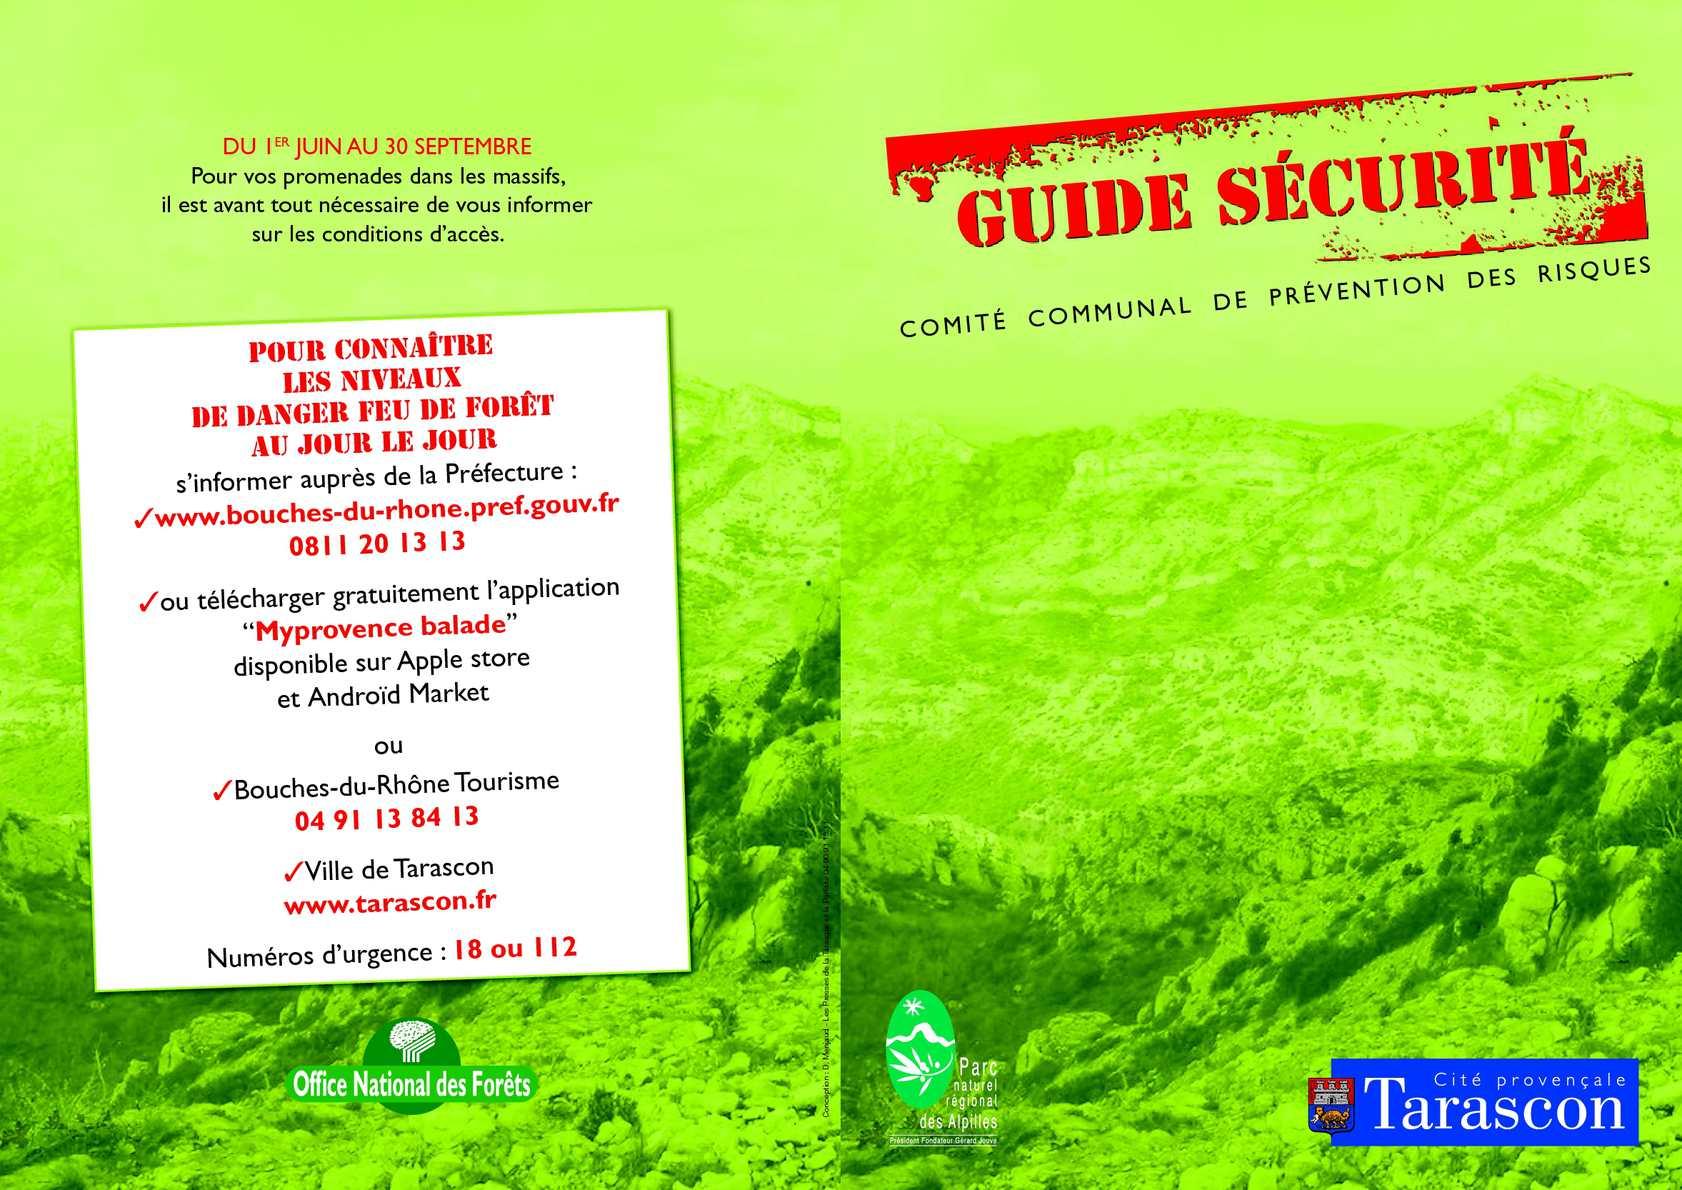 calam o guide 2012 protection alpilles et montagnette vigilance incendie tarascon. Black Bedroom Furniture Sets. Home Design Ideas